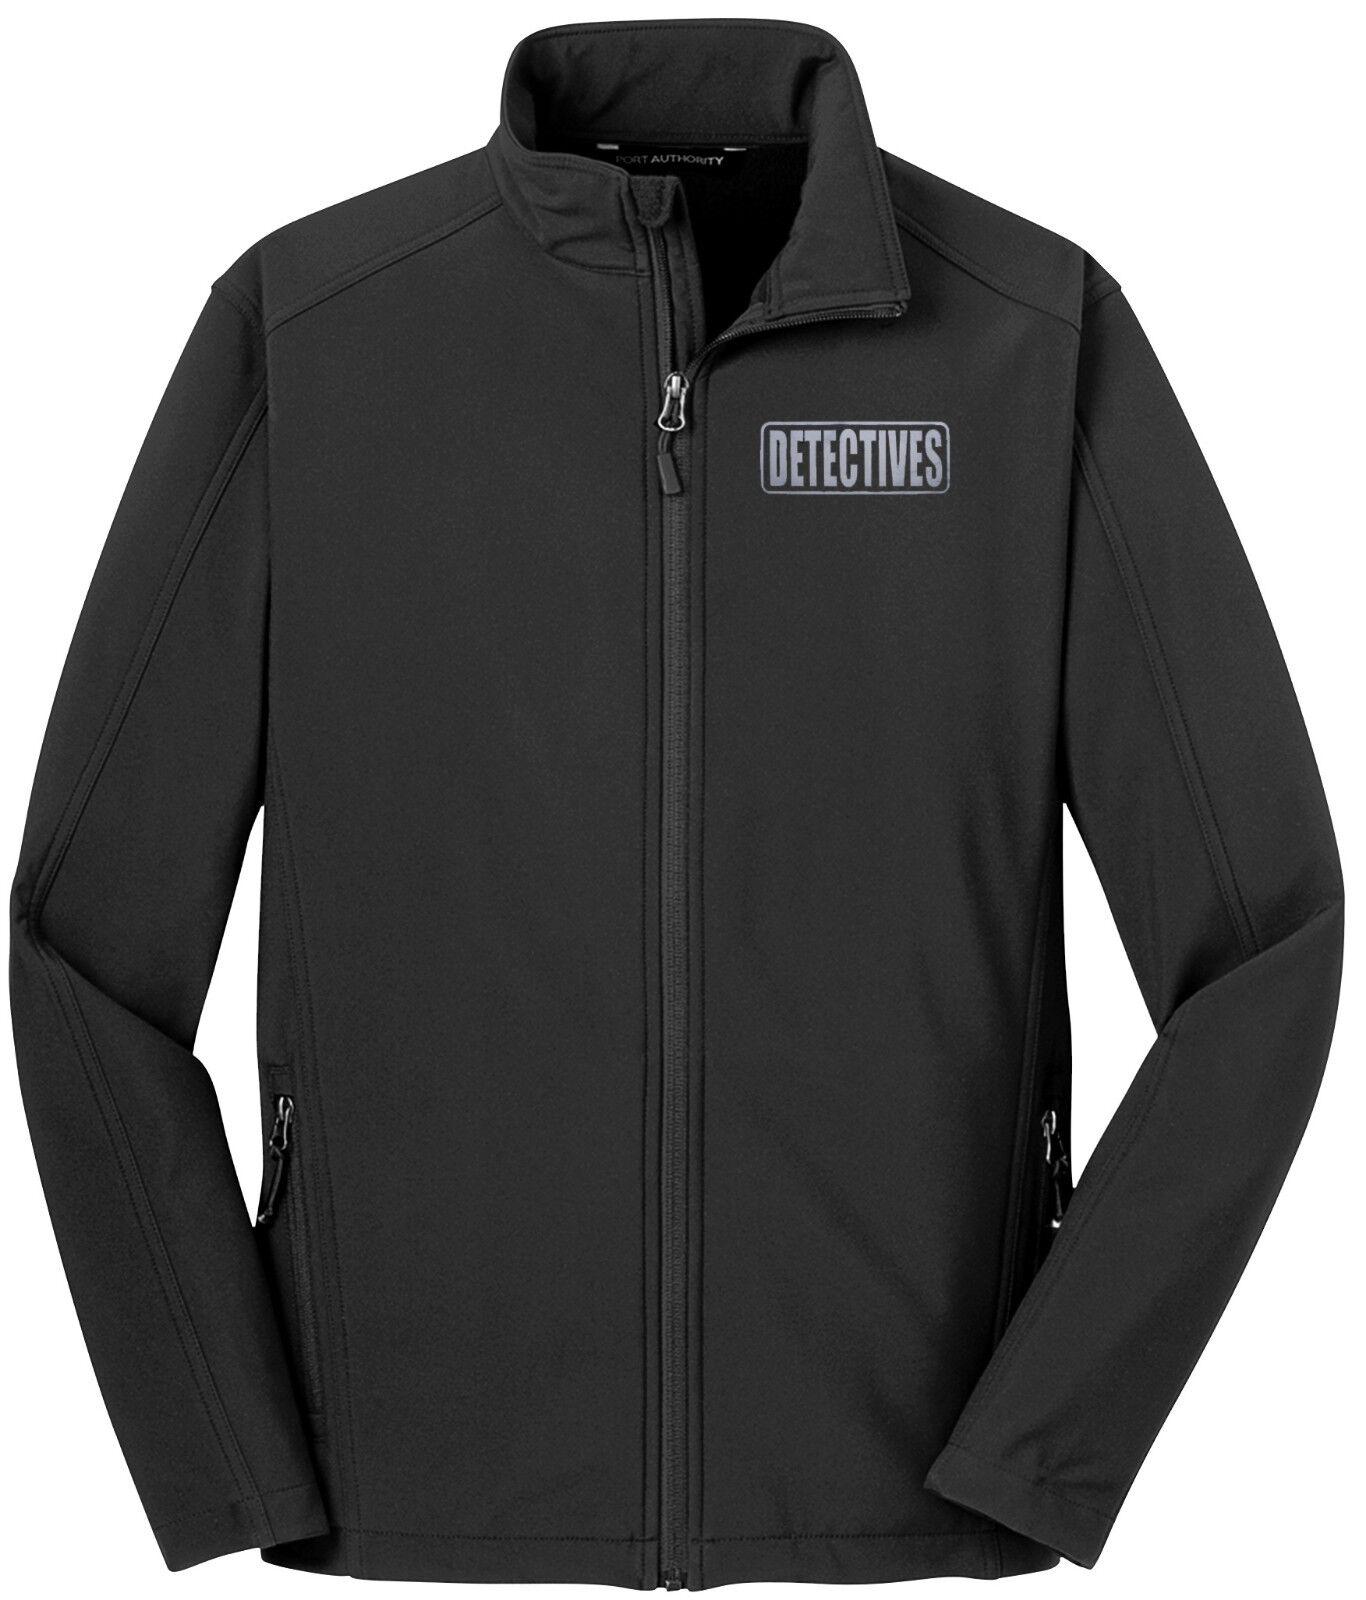 Detective jacket, High Quality, REFLECTIVE LOGO, Investigator jacket